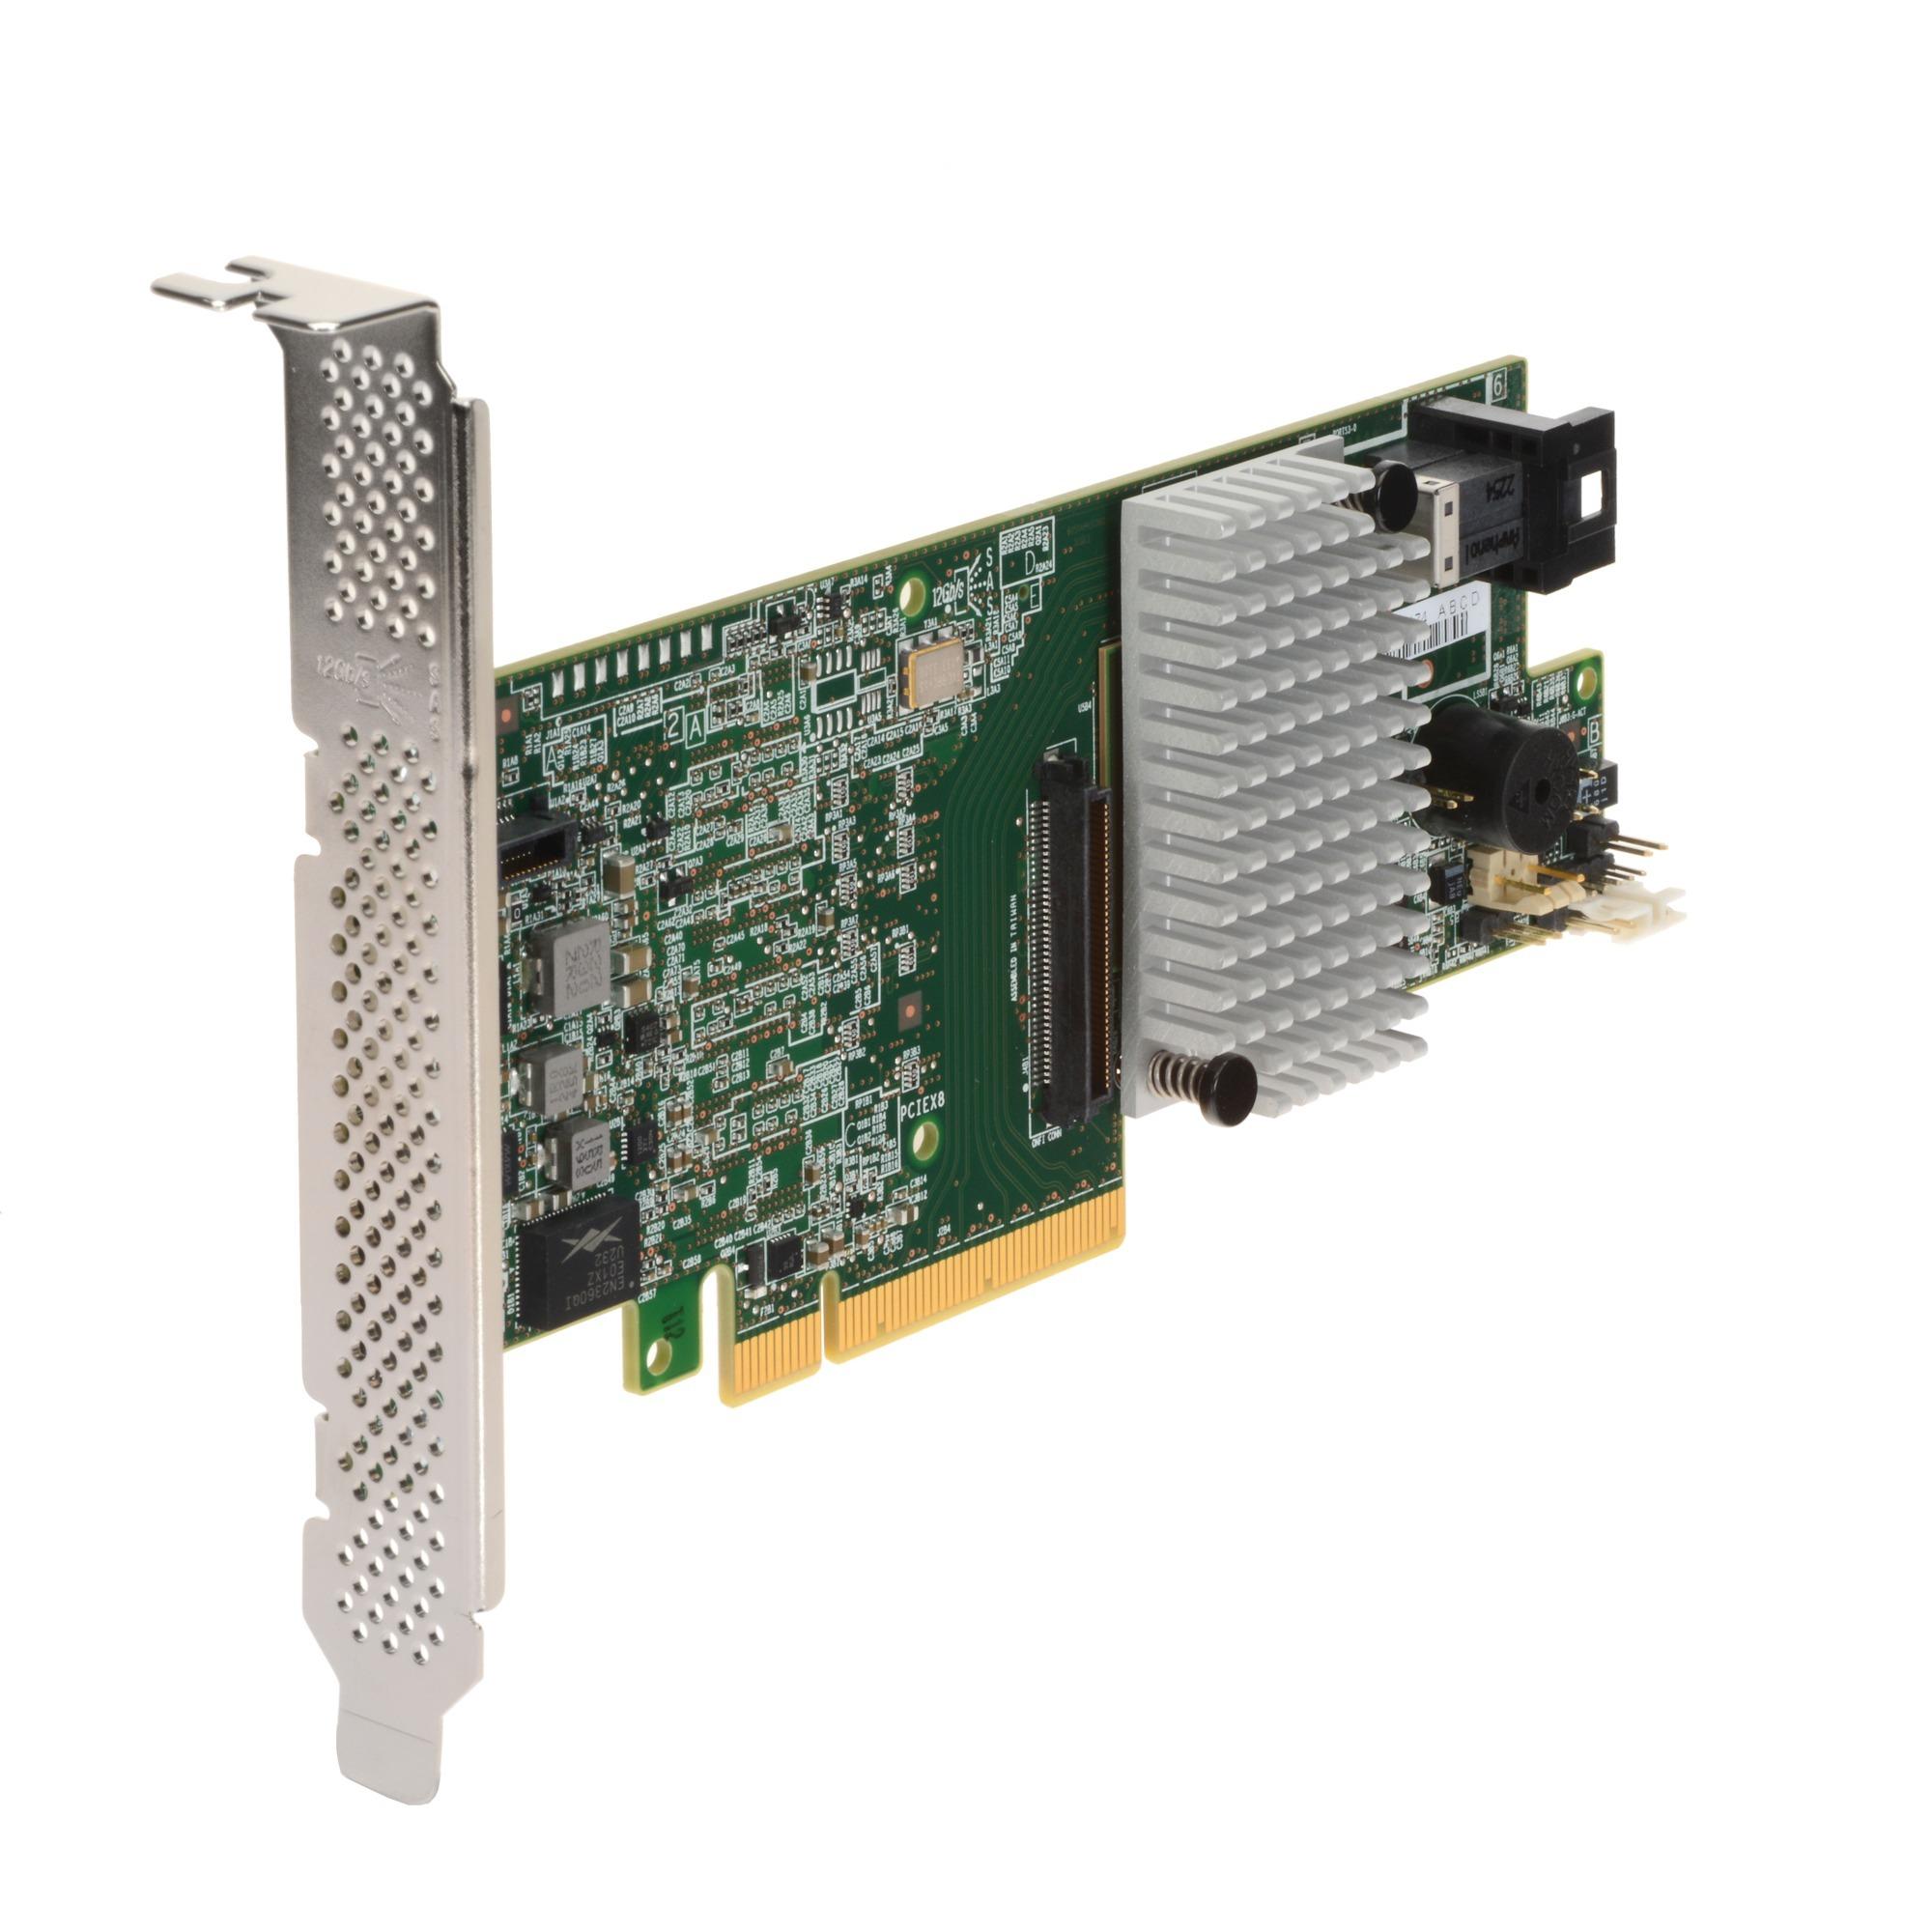 MegaRAID SAS 9361-4i controlado RAID PCI Express x8 3.0 12 Gbit/s, Controlador